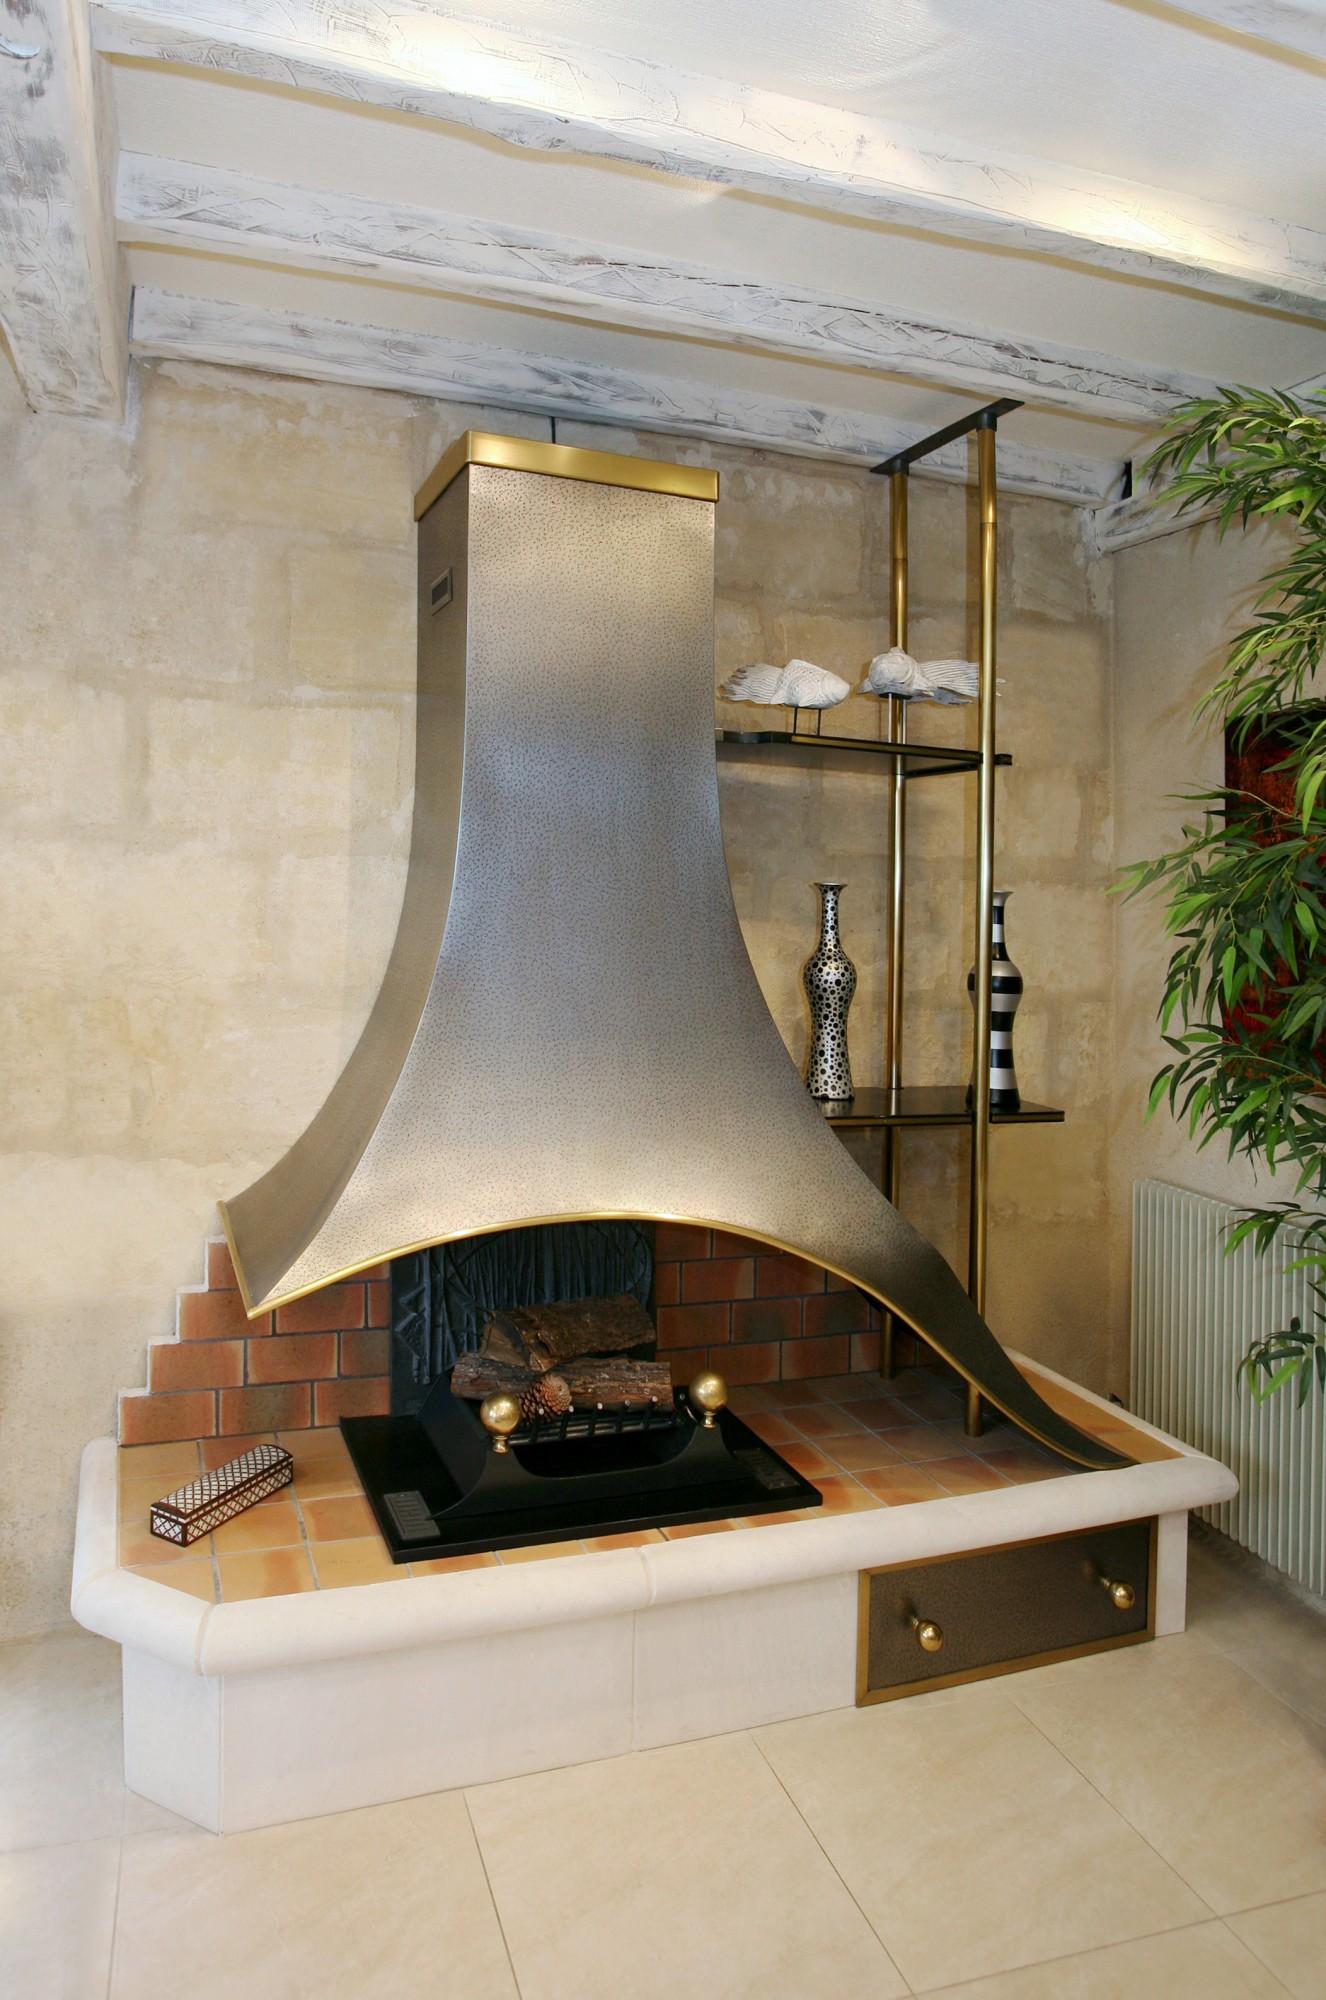 modele de cheminee energies naturels. Black Bedroom Furniture Sets. Home Design Ideas